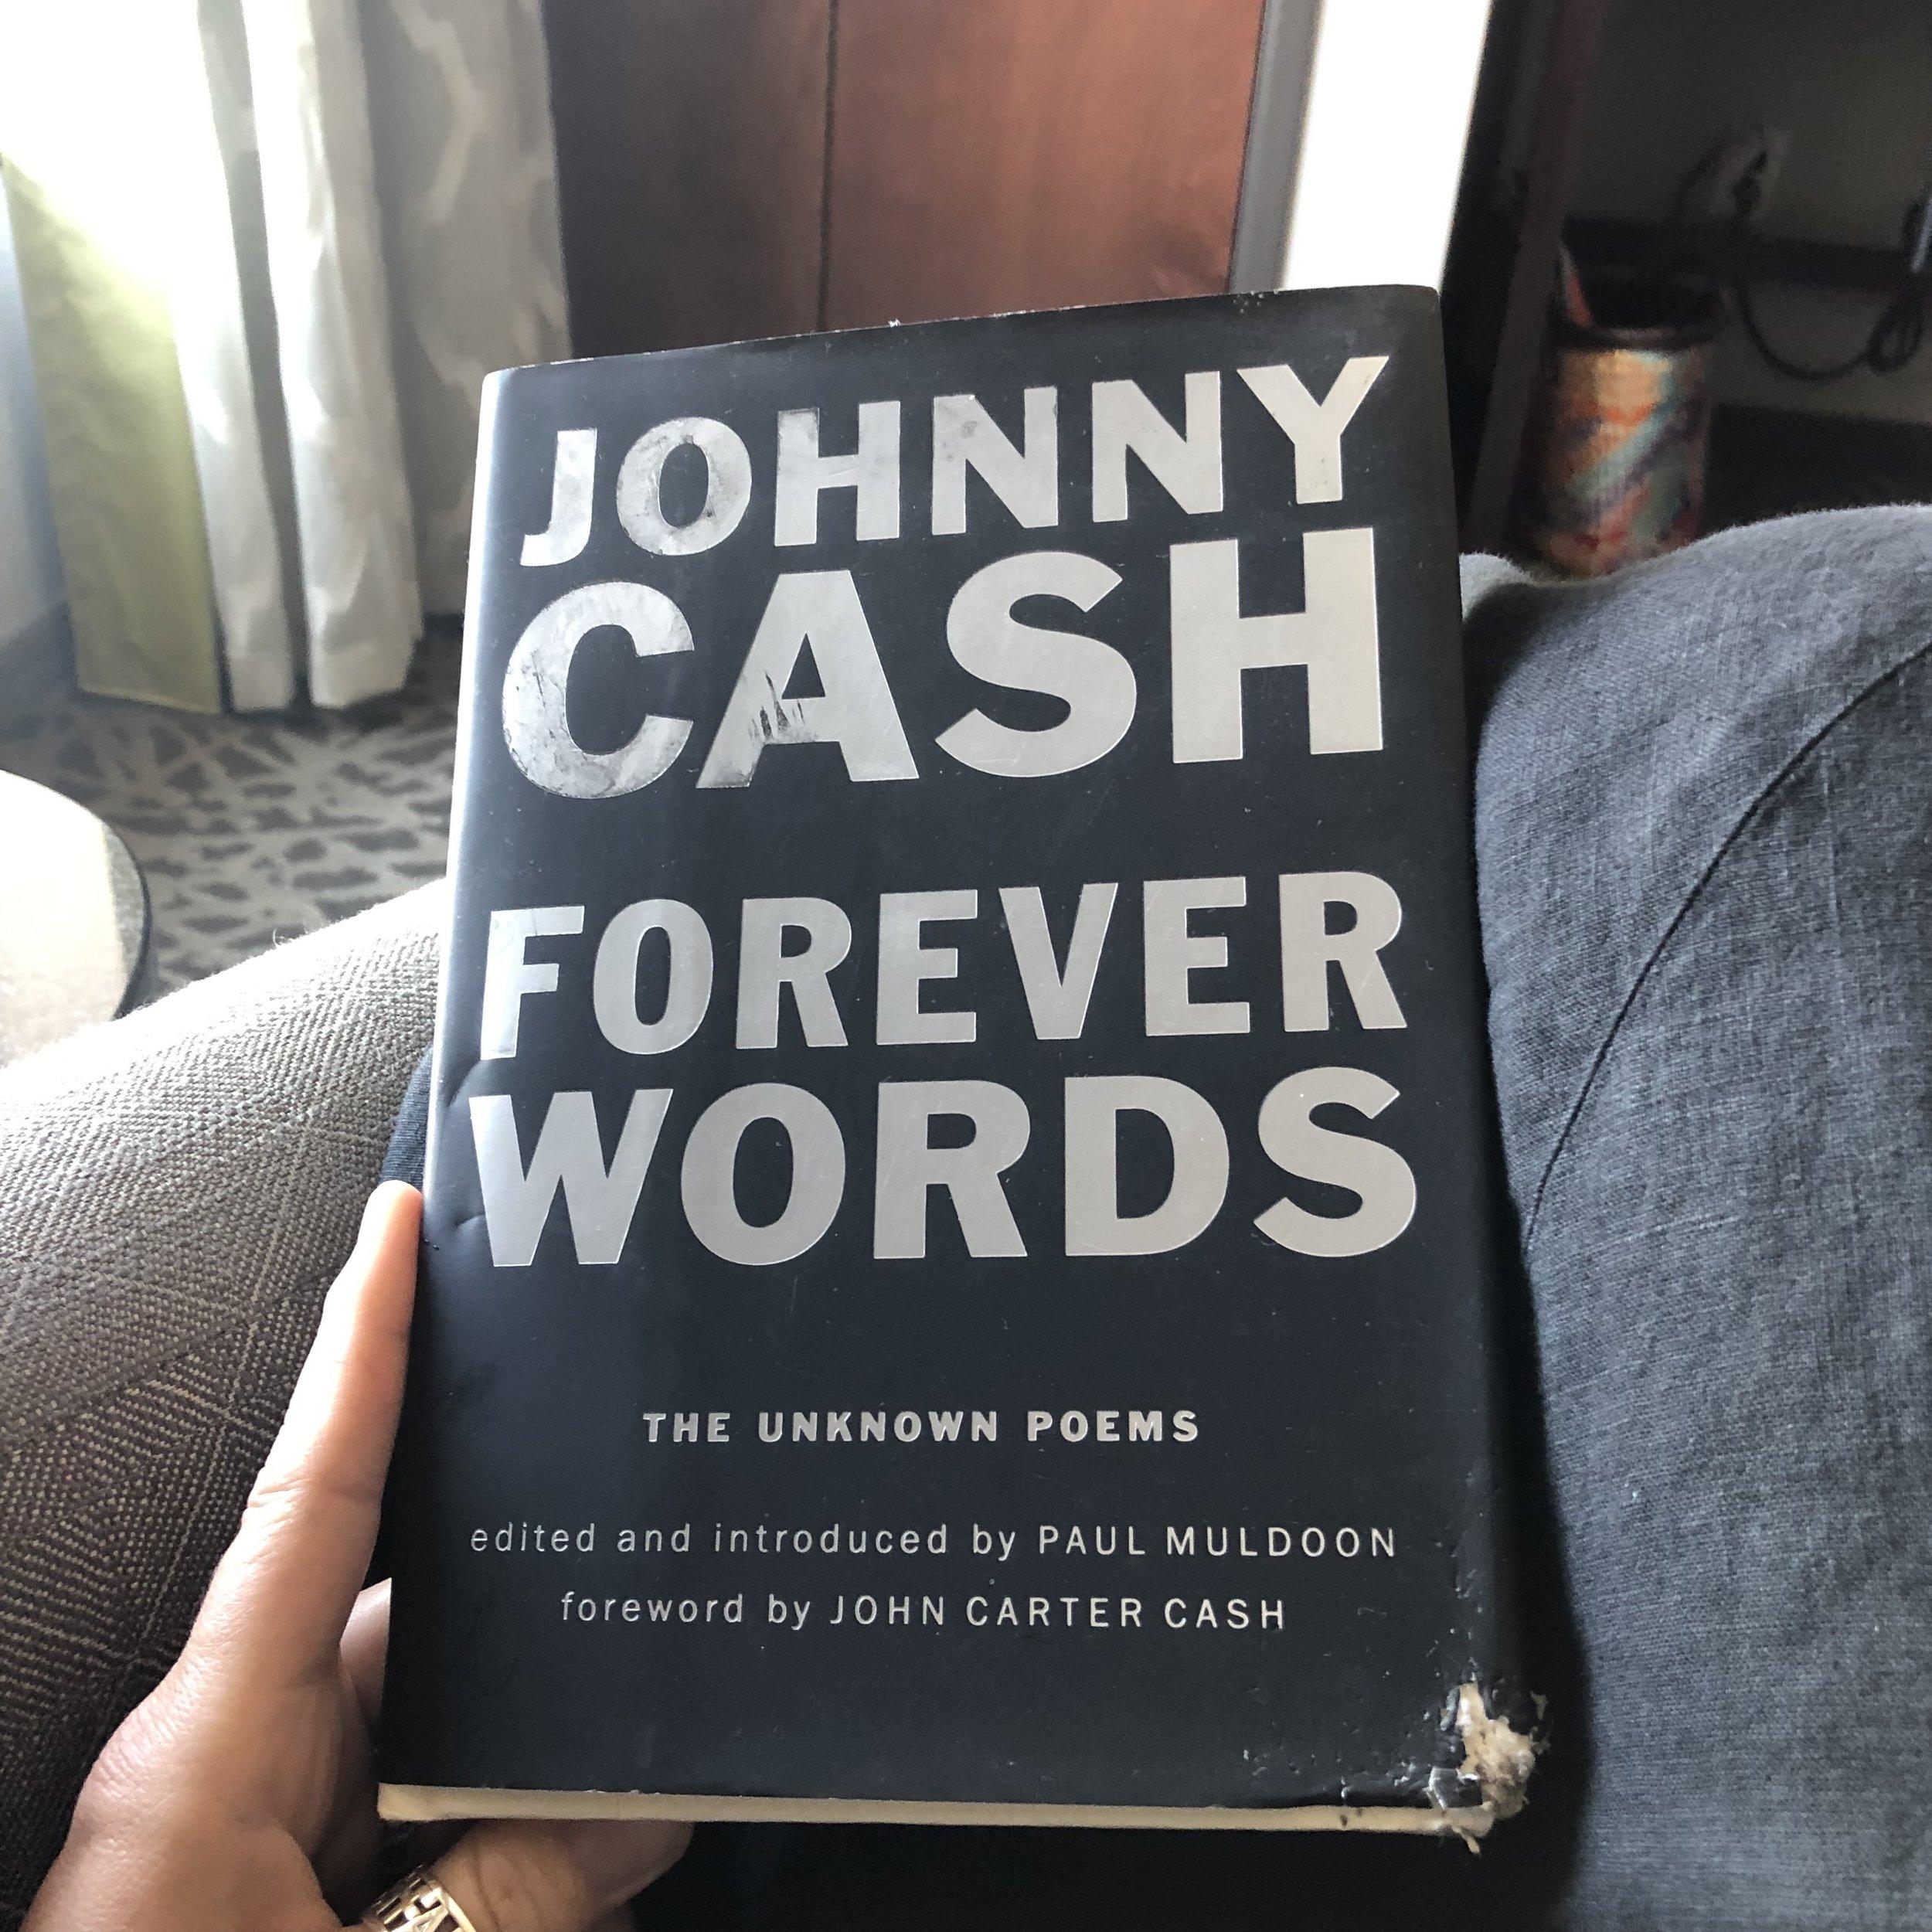 JohnnyCashForeverWords.JPG